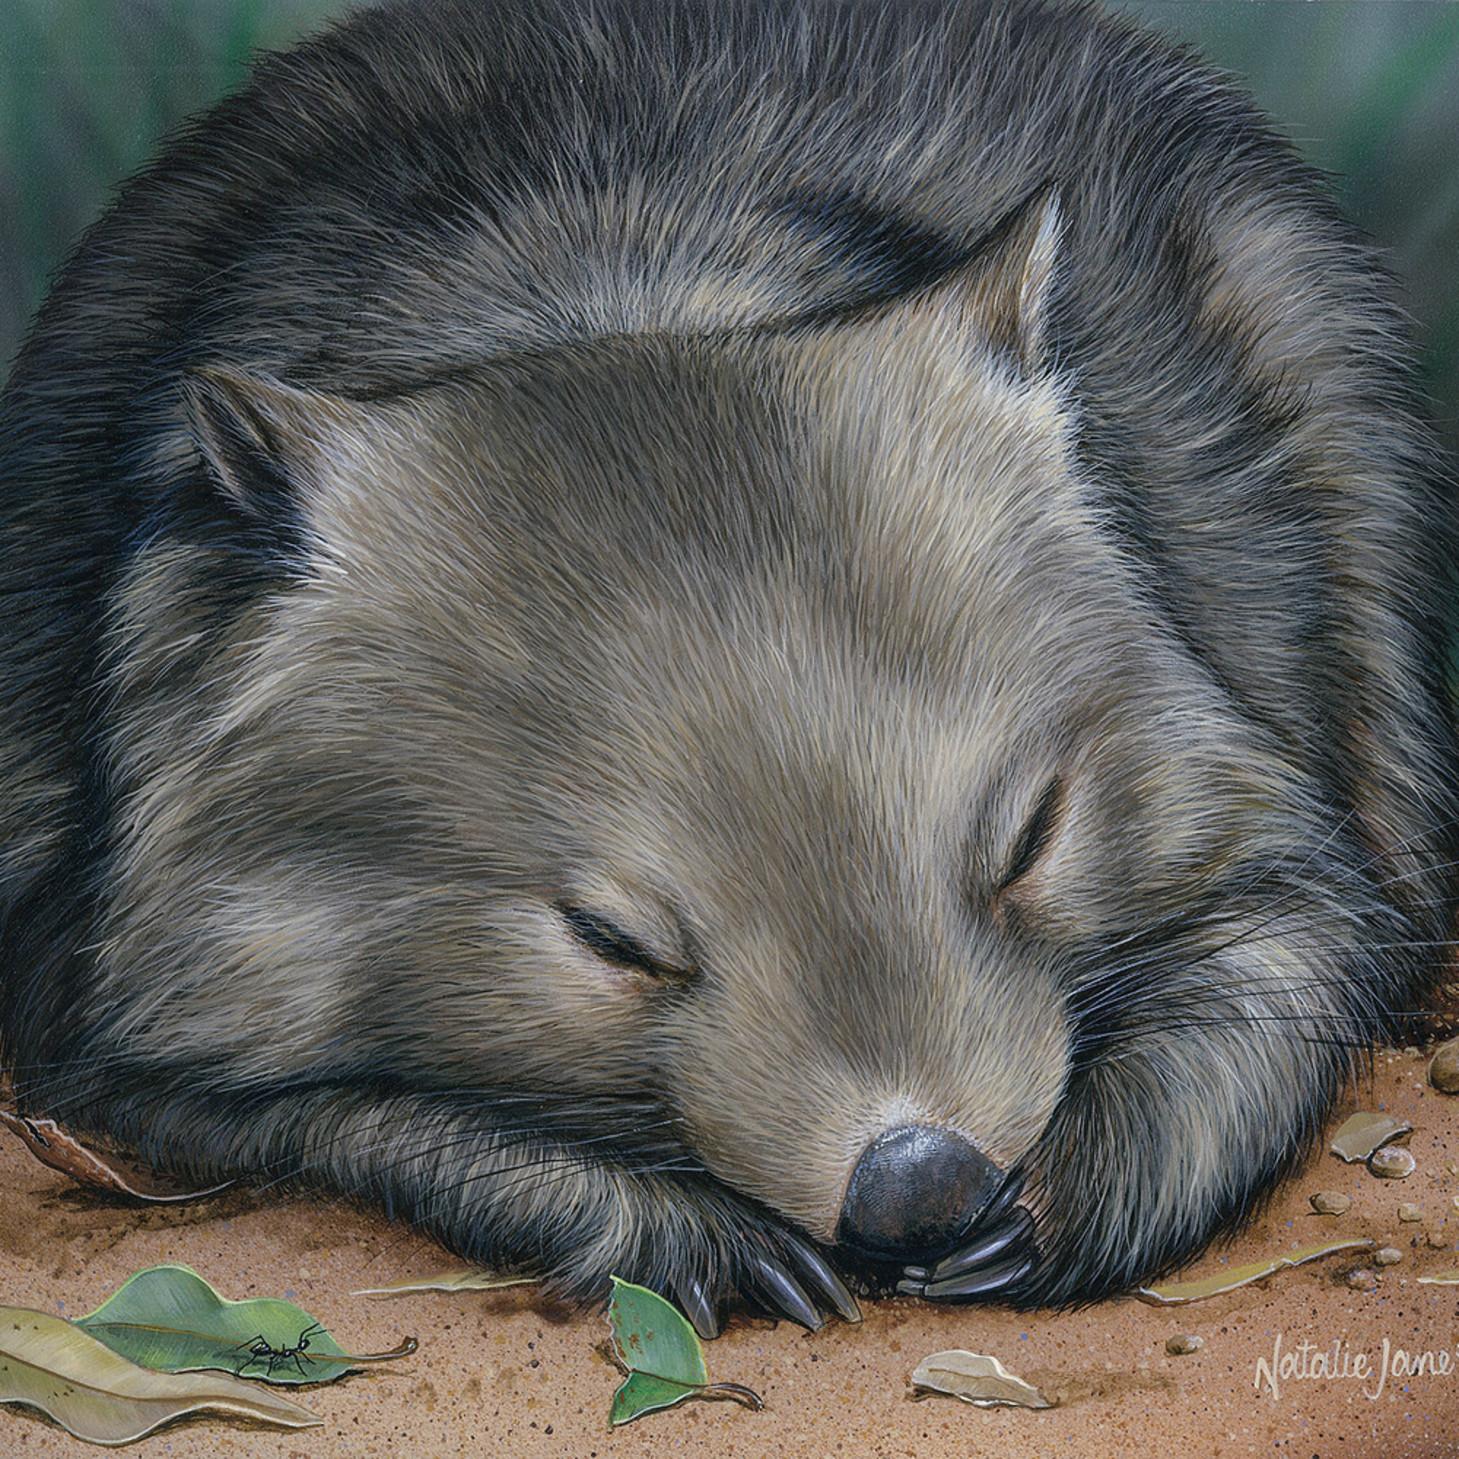 Sleeping soundly   sleeping common wombat natalie jane parker australian native wildlife z26svr